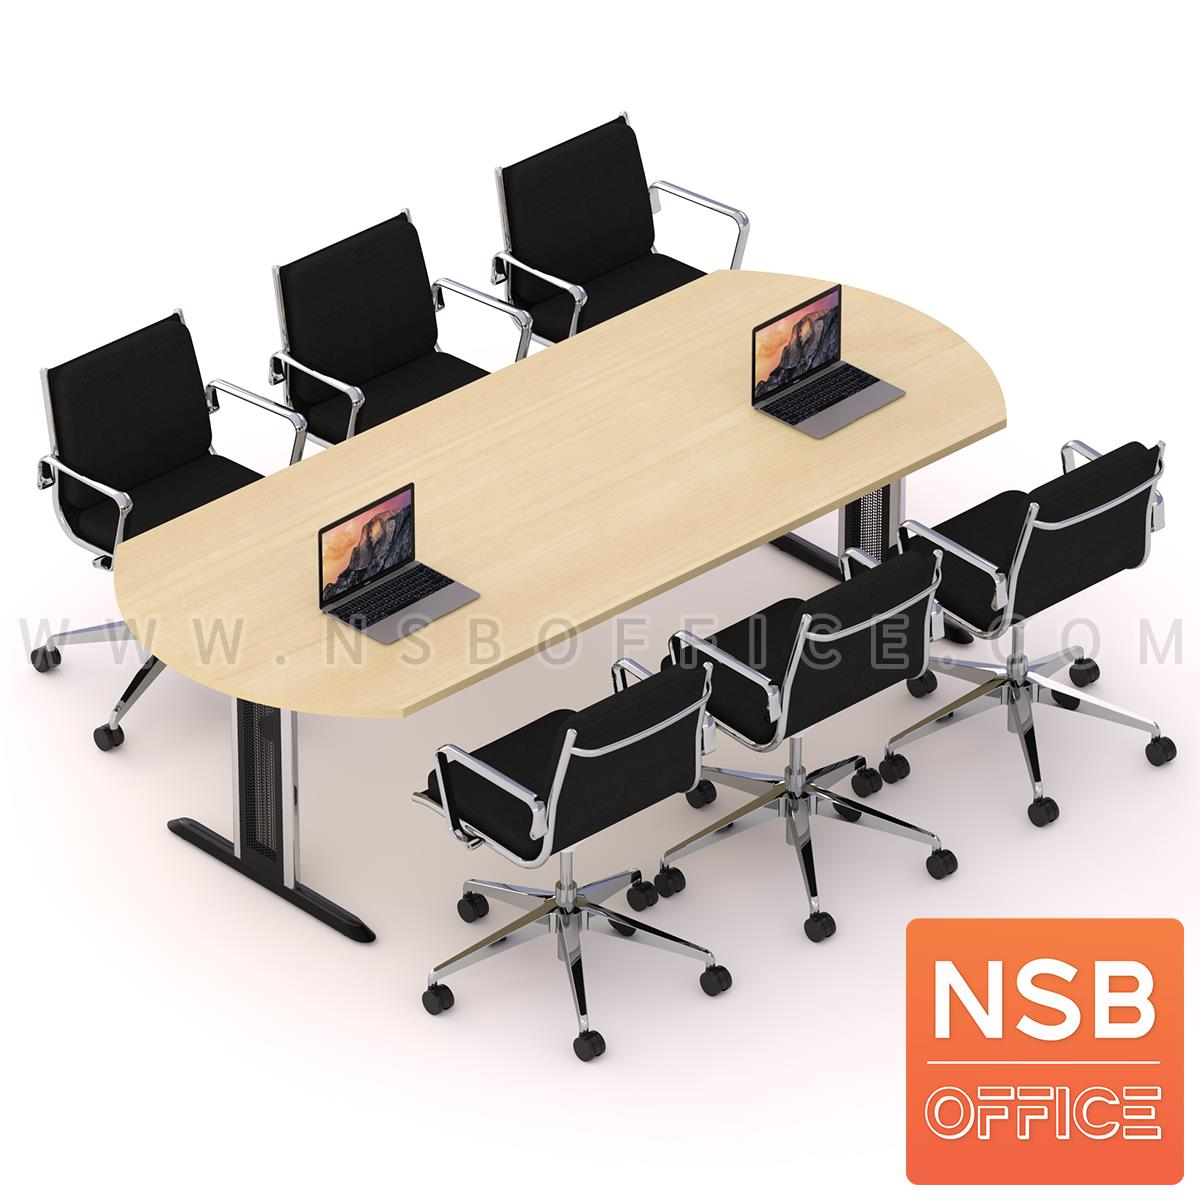 A05A138:โต๊ะประชุมทรงเหลี่ยมหัวโค้ง  ขนาด 180W ,200W ,240W cm.  พร้อมระบบคานเหล็ก ขาเหล็กตัวไอ